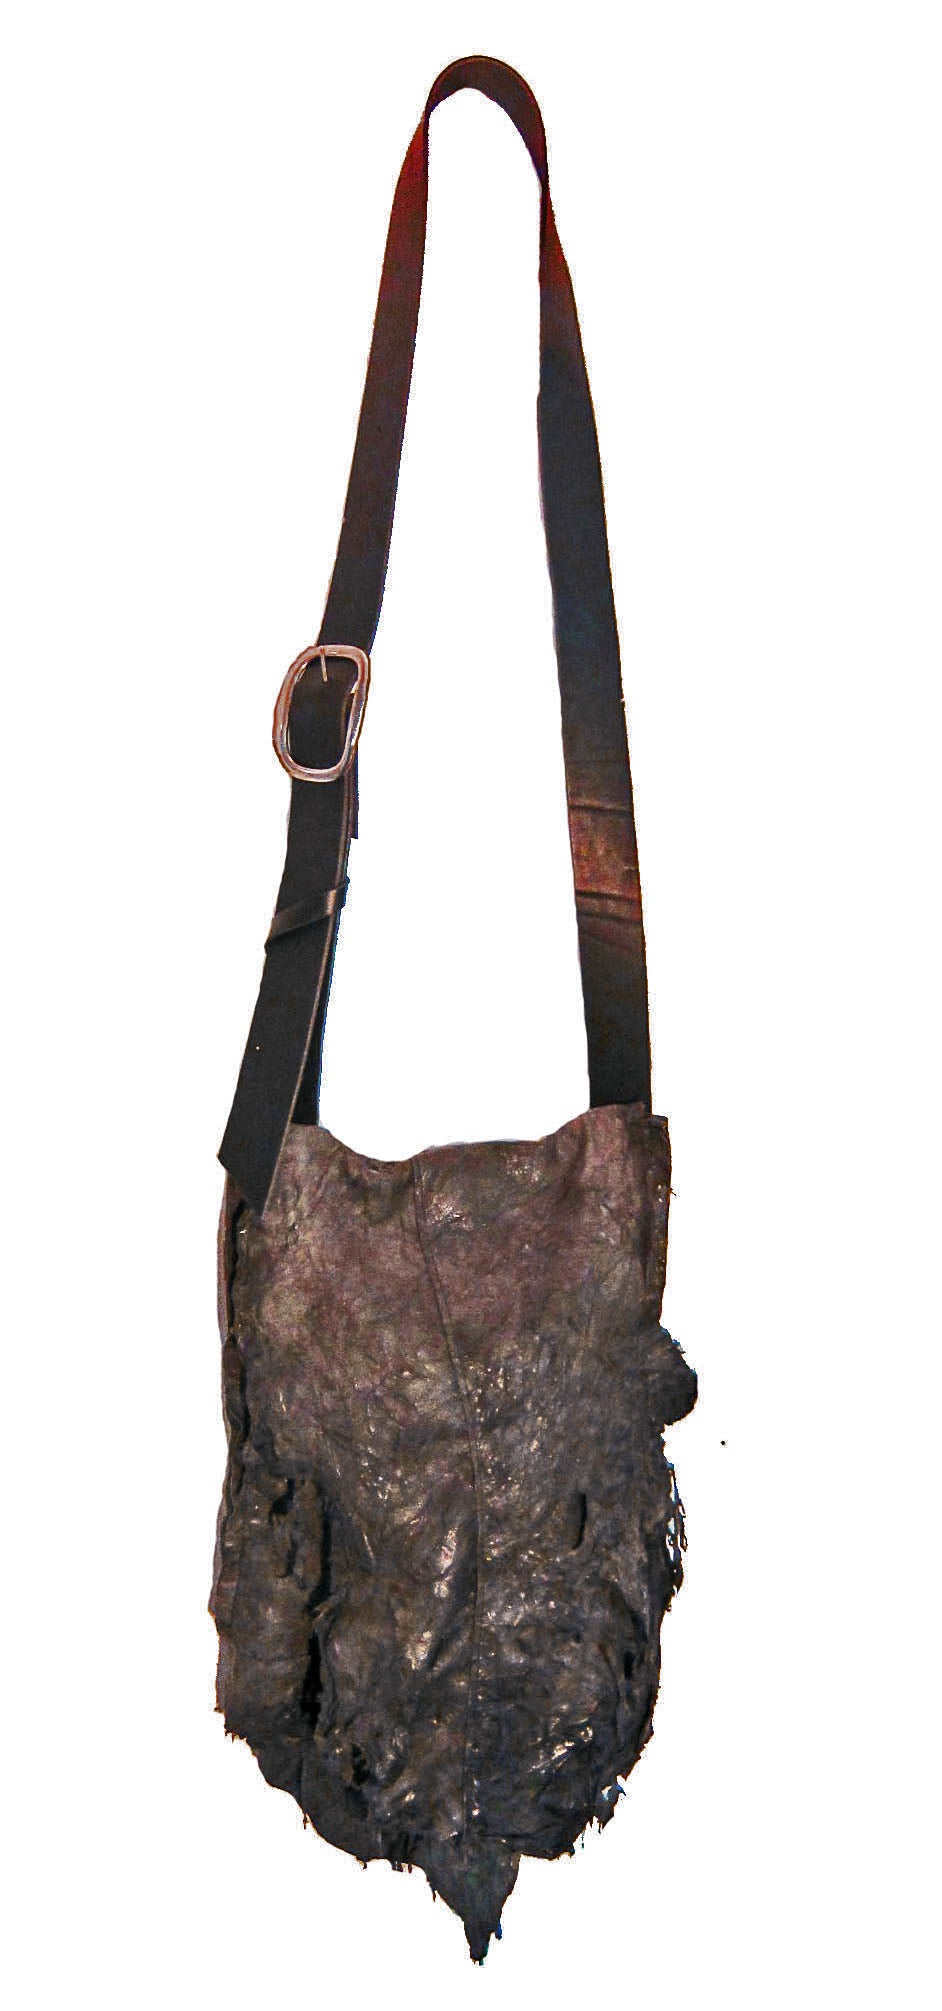 Image of the Kashmir Bag